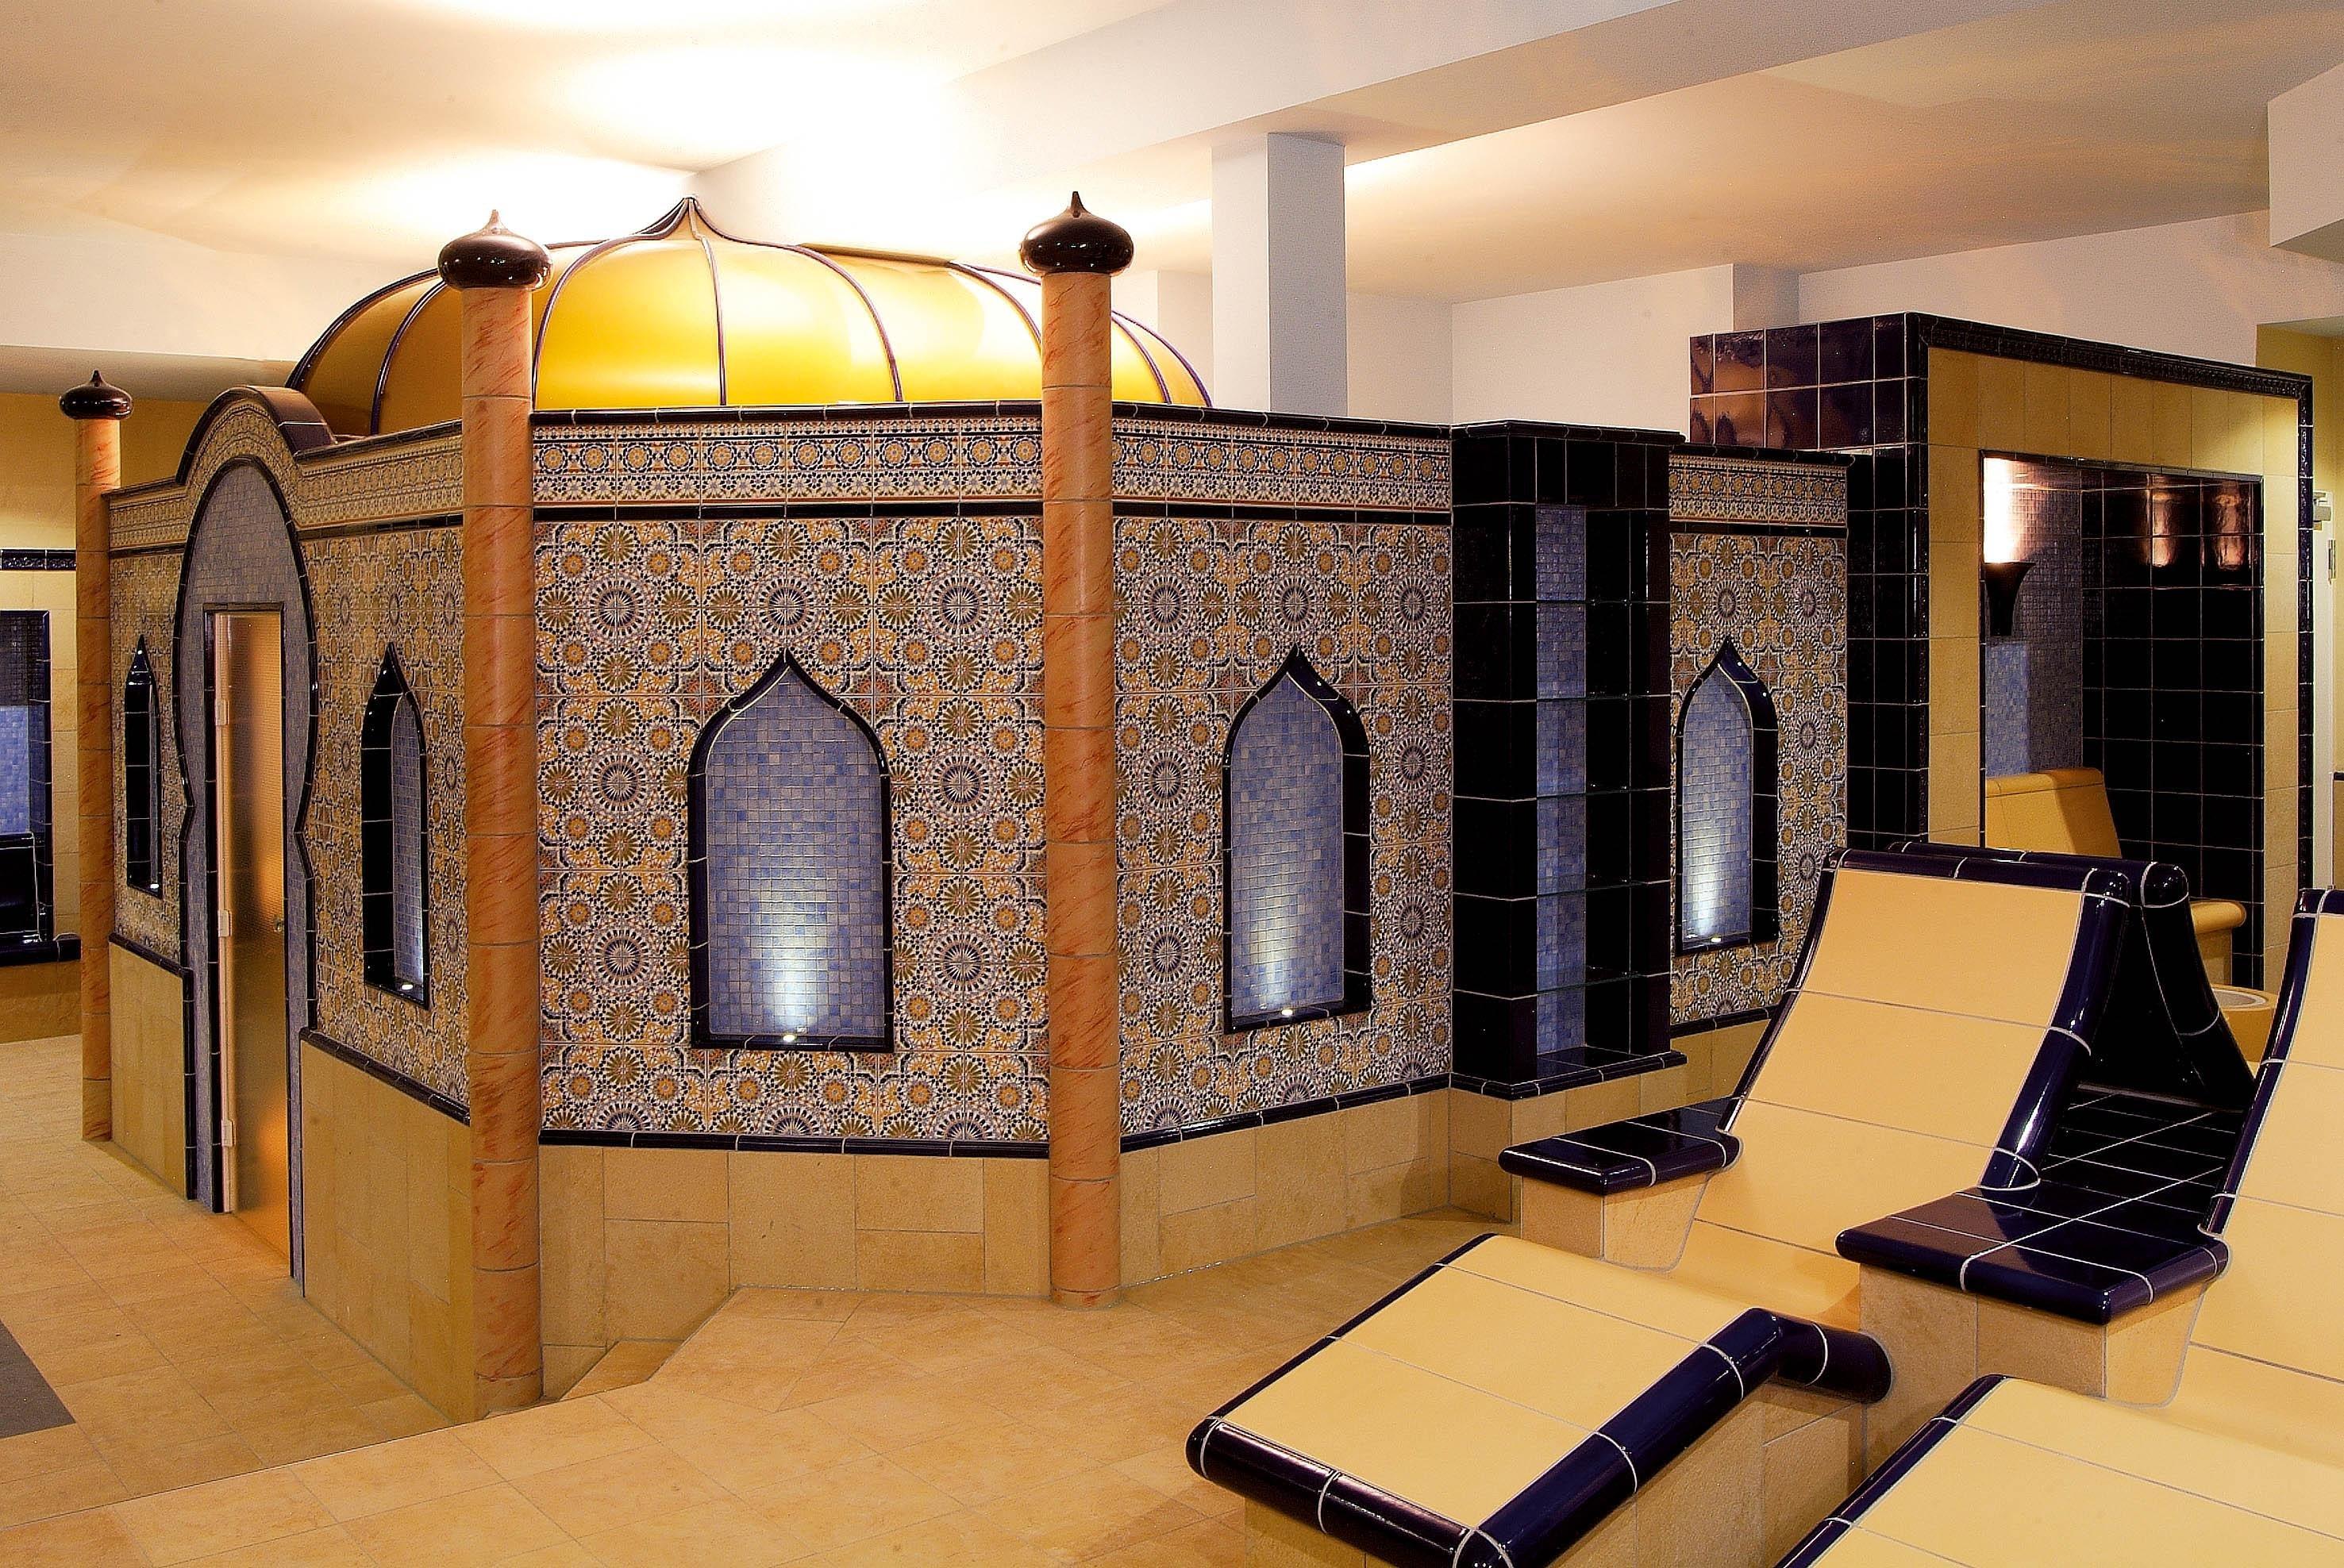 hamam-in-arabien-13498 Faszinierend 7 Welten Fulda Bewertung Dekorationen